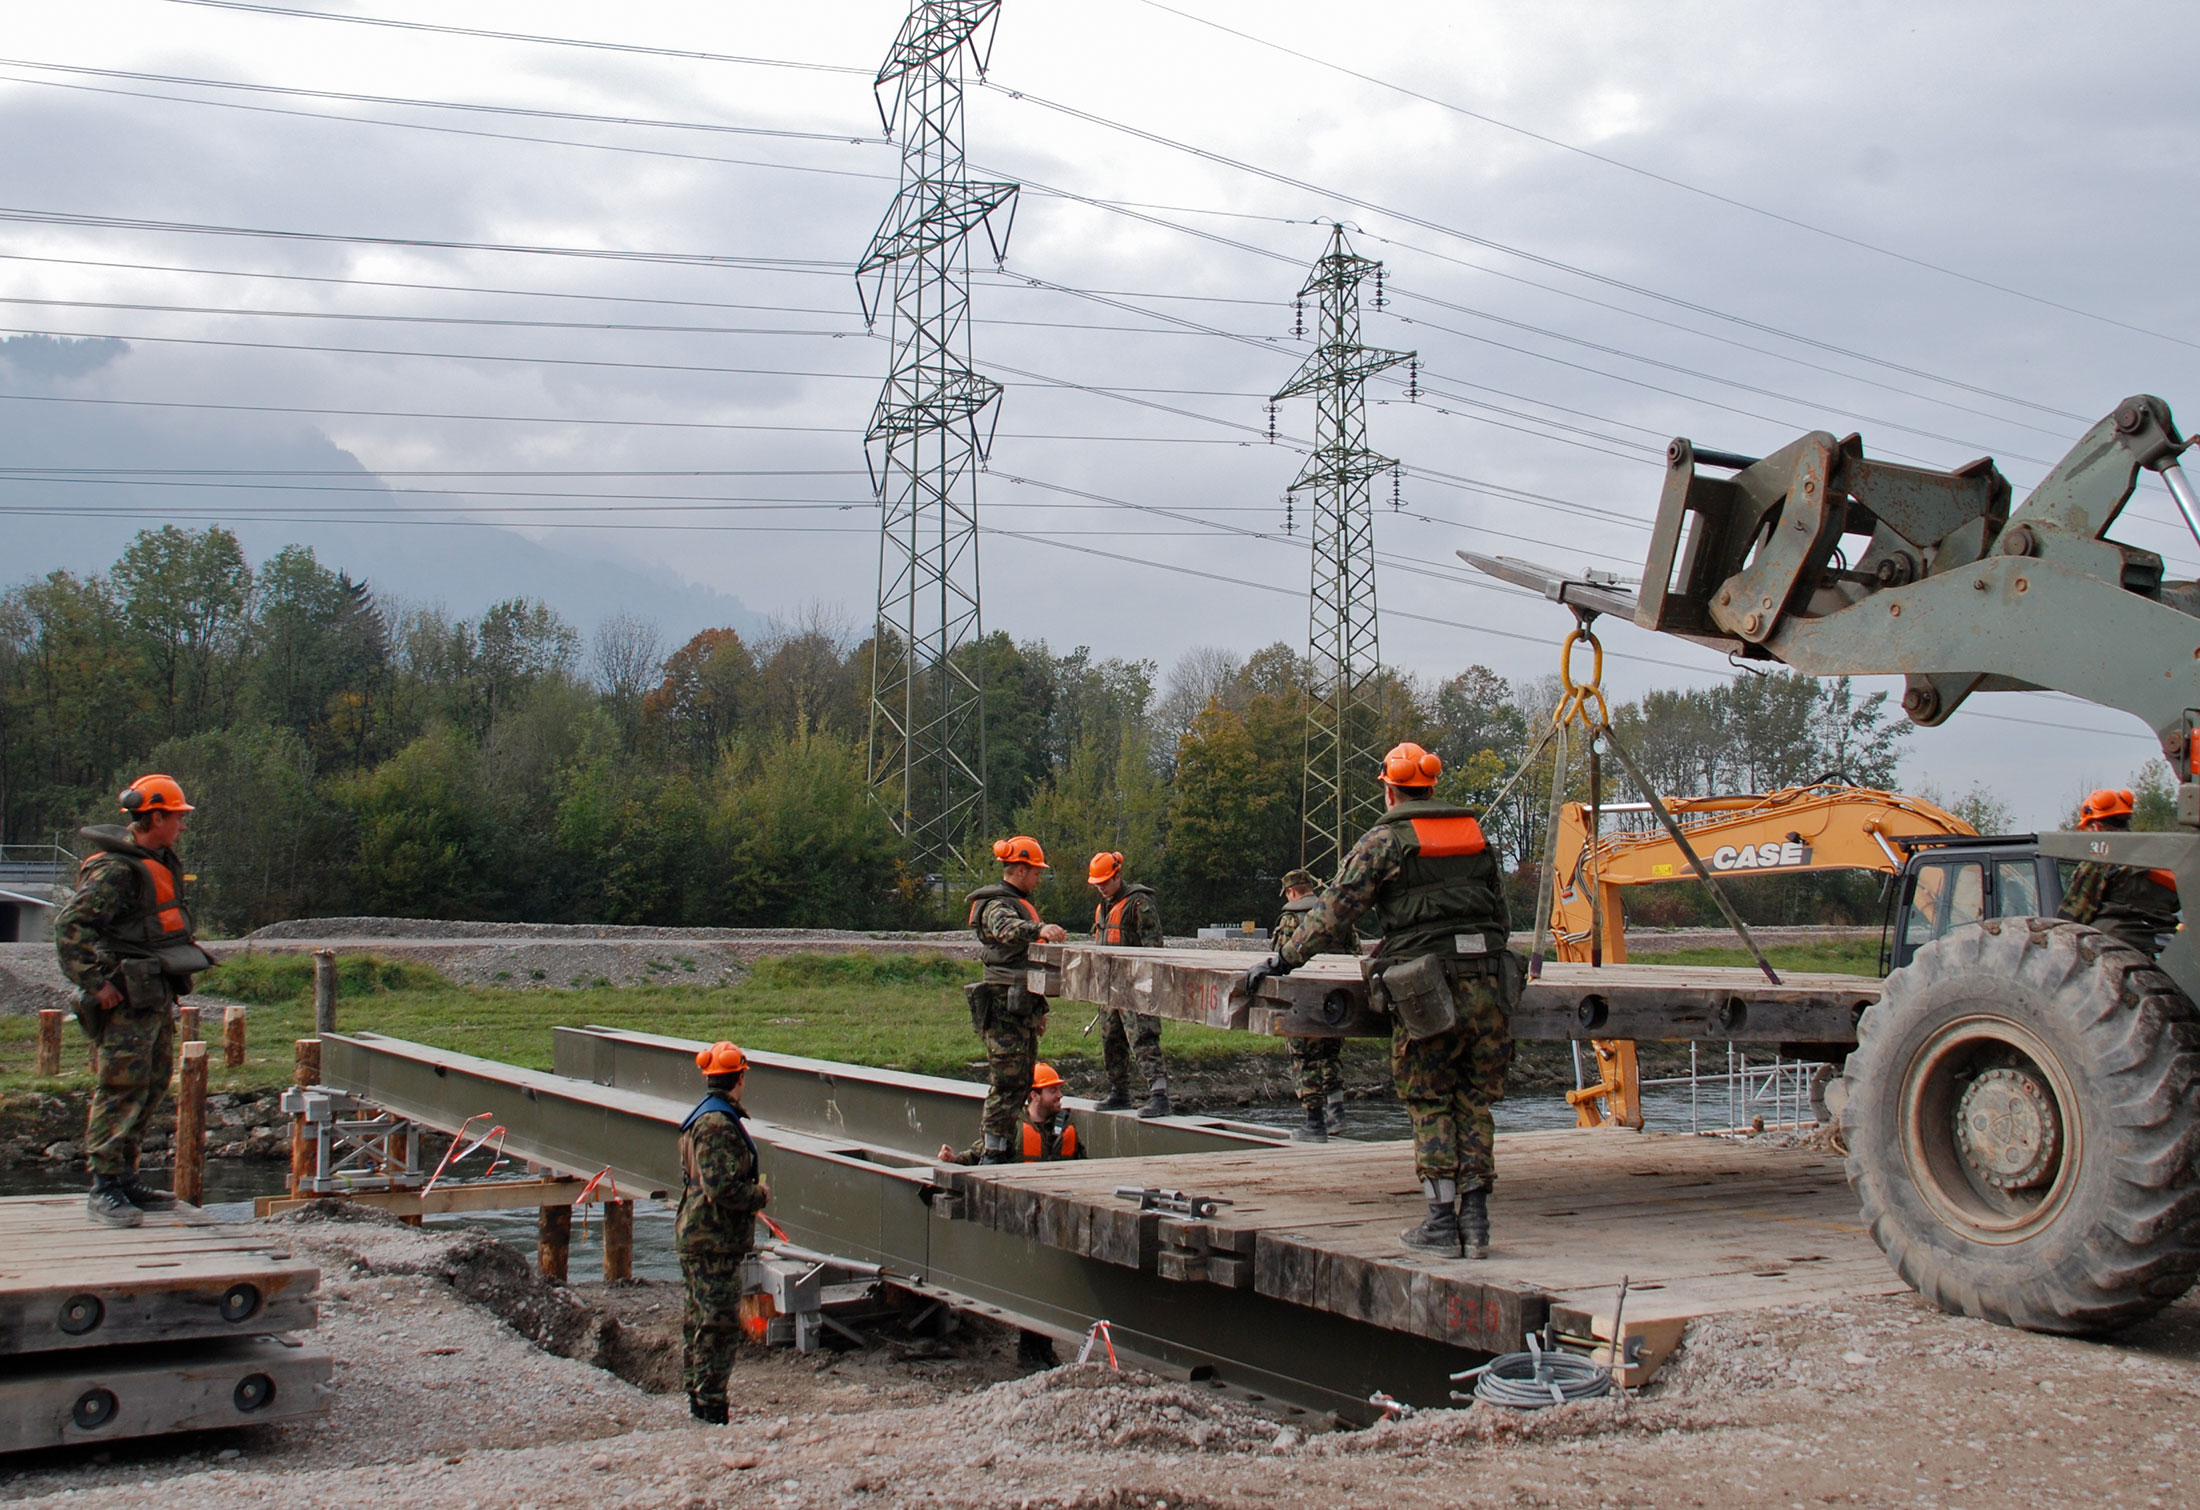 Stahlträgerbrücke des Miltärs als Baubrücke